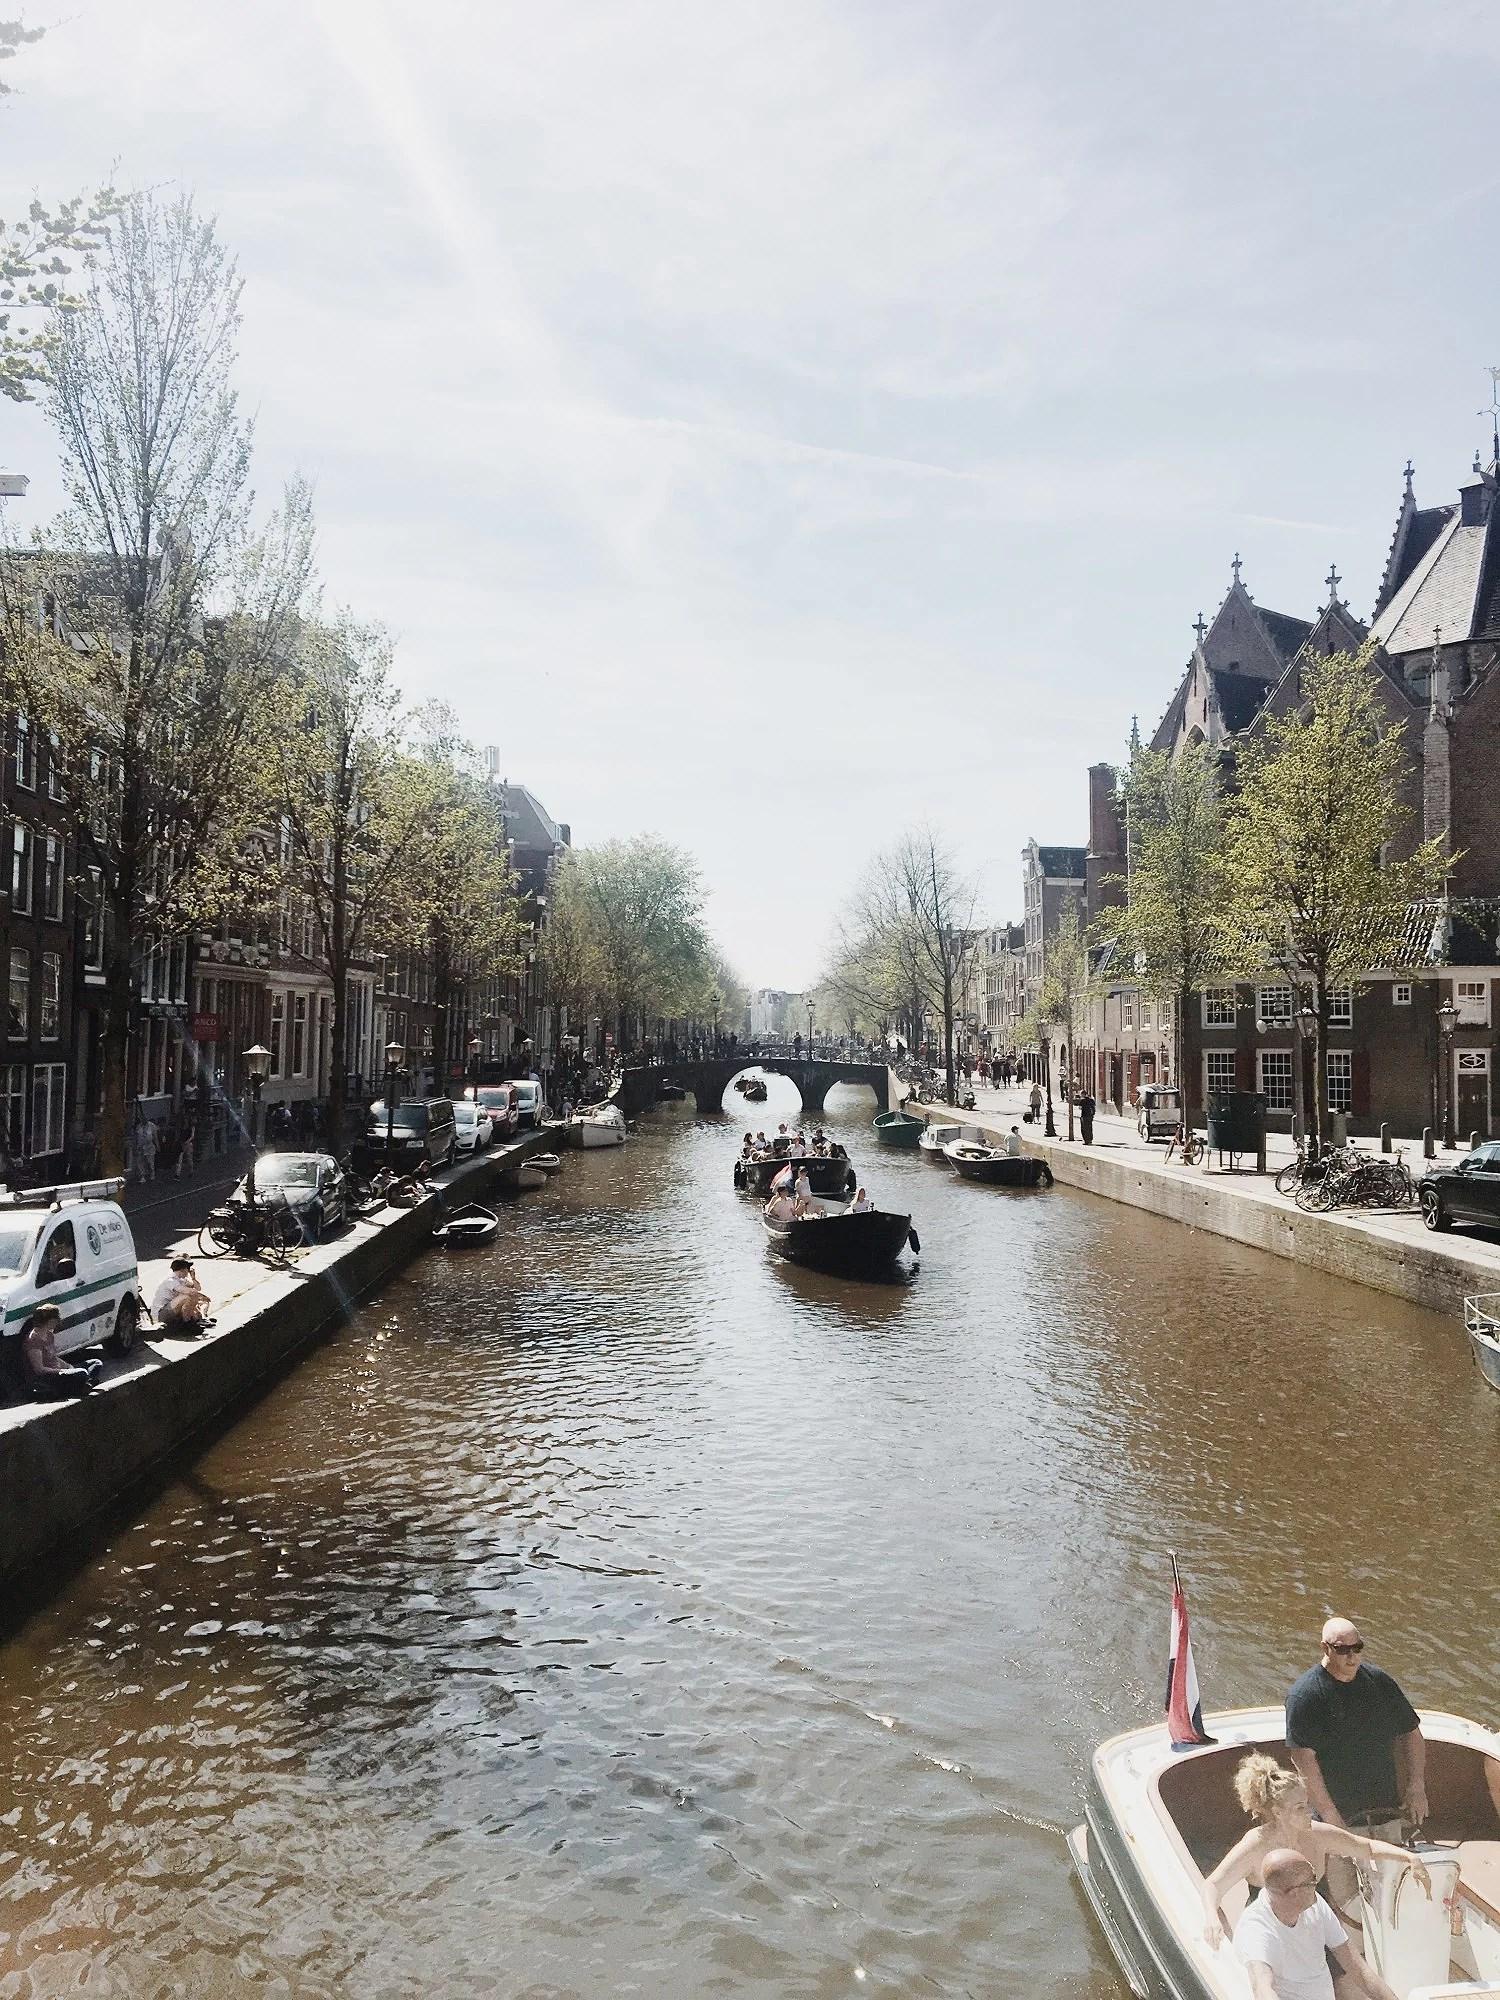 SNAPSHOTS FROM AMSTERDAM